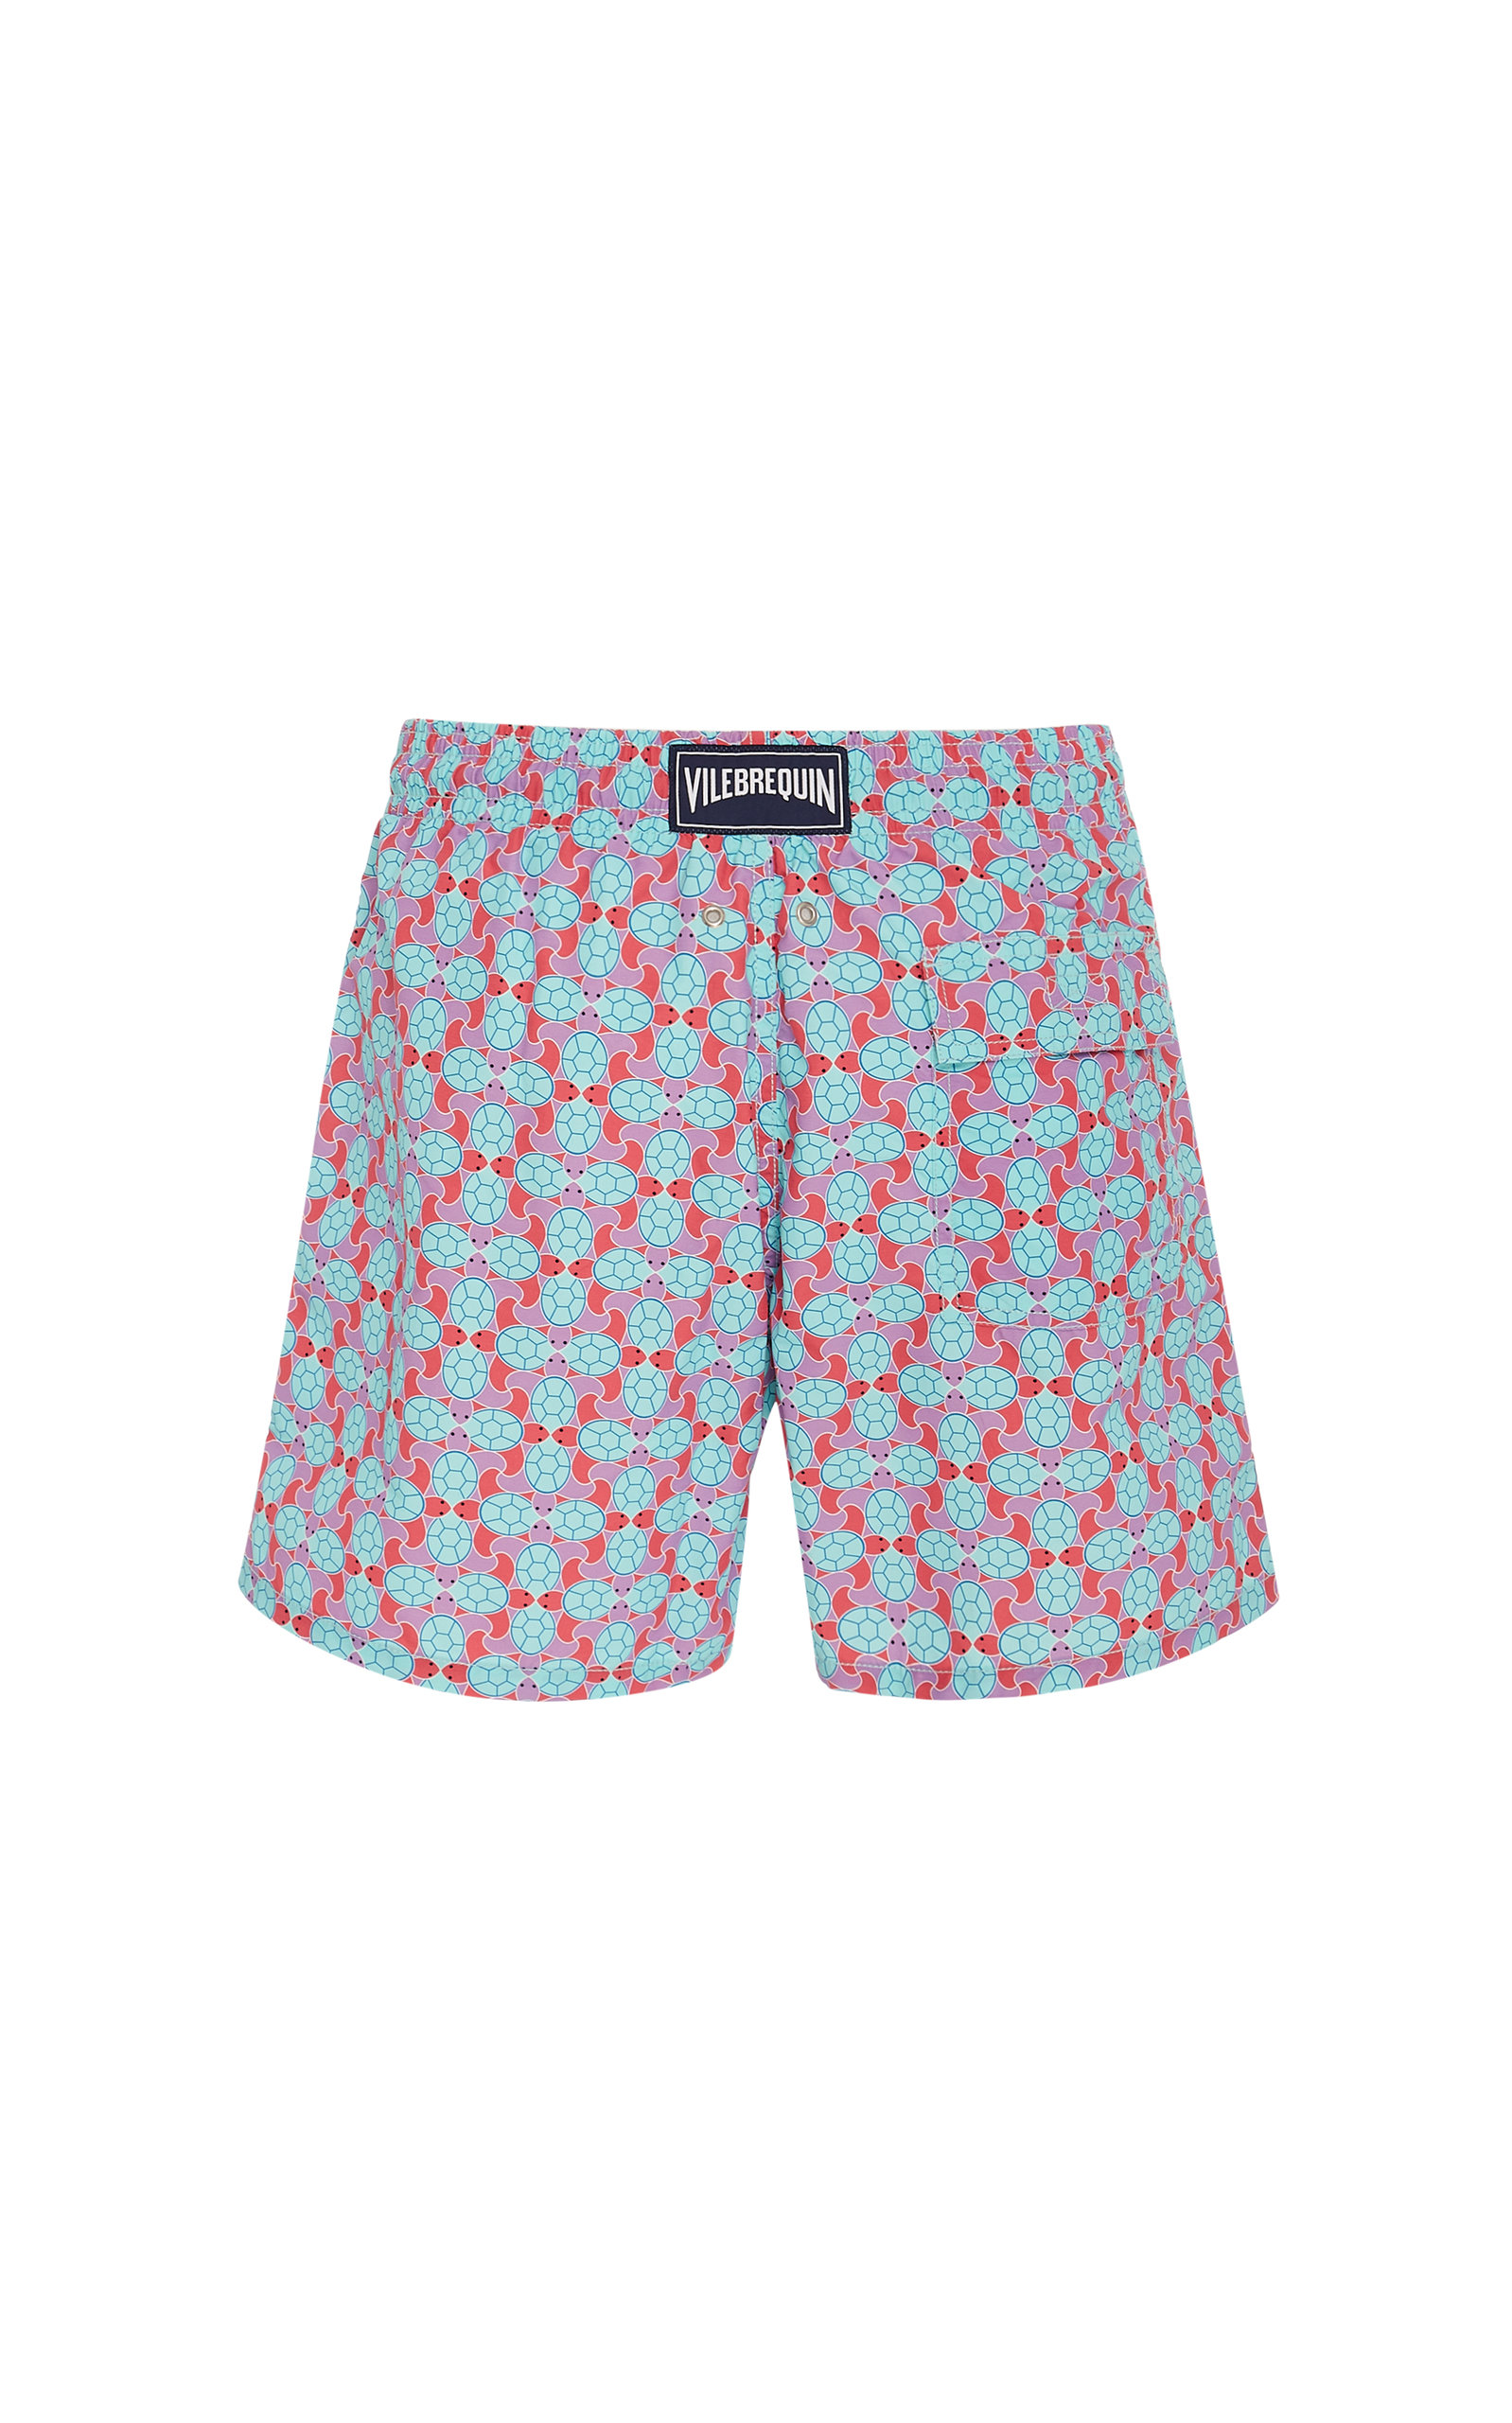 20c18977db VilebrequinMoorea Data Turtles Printed Swim Shorts. CLOSE. Loading. Loading